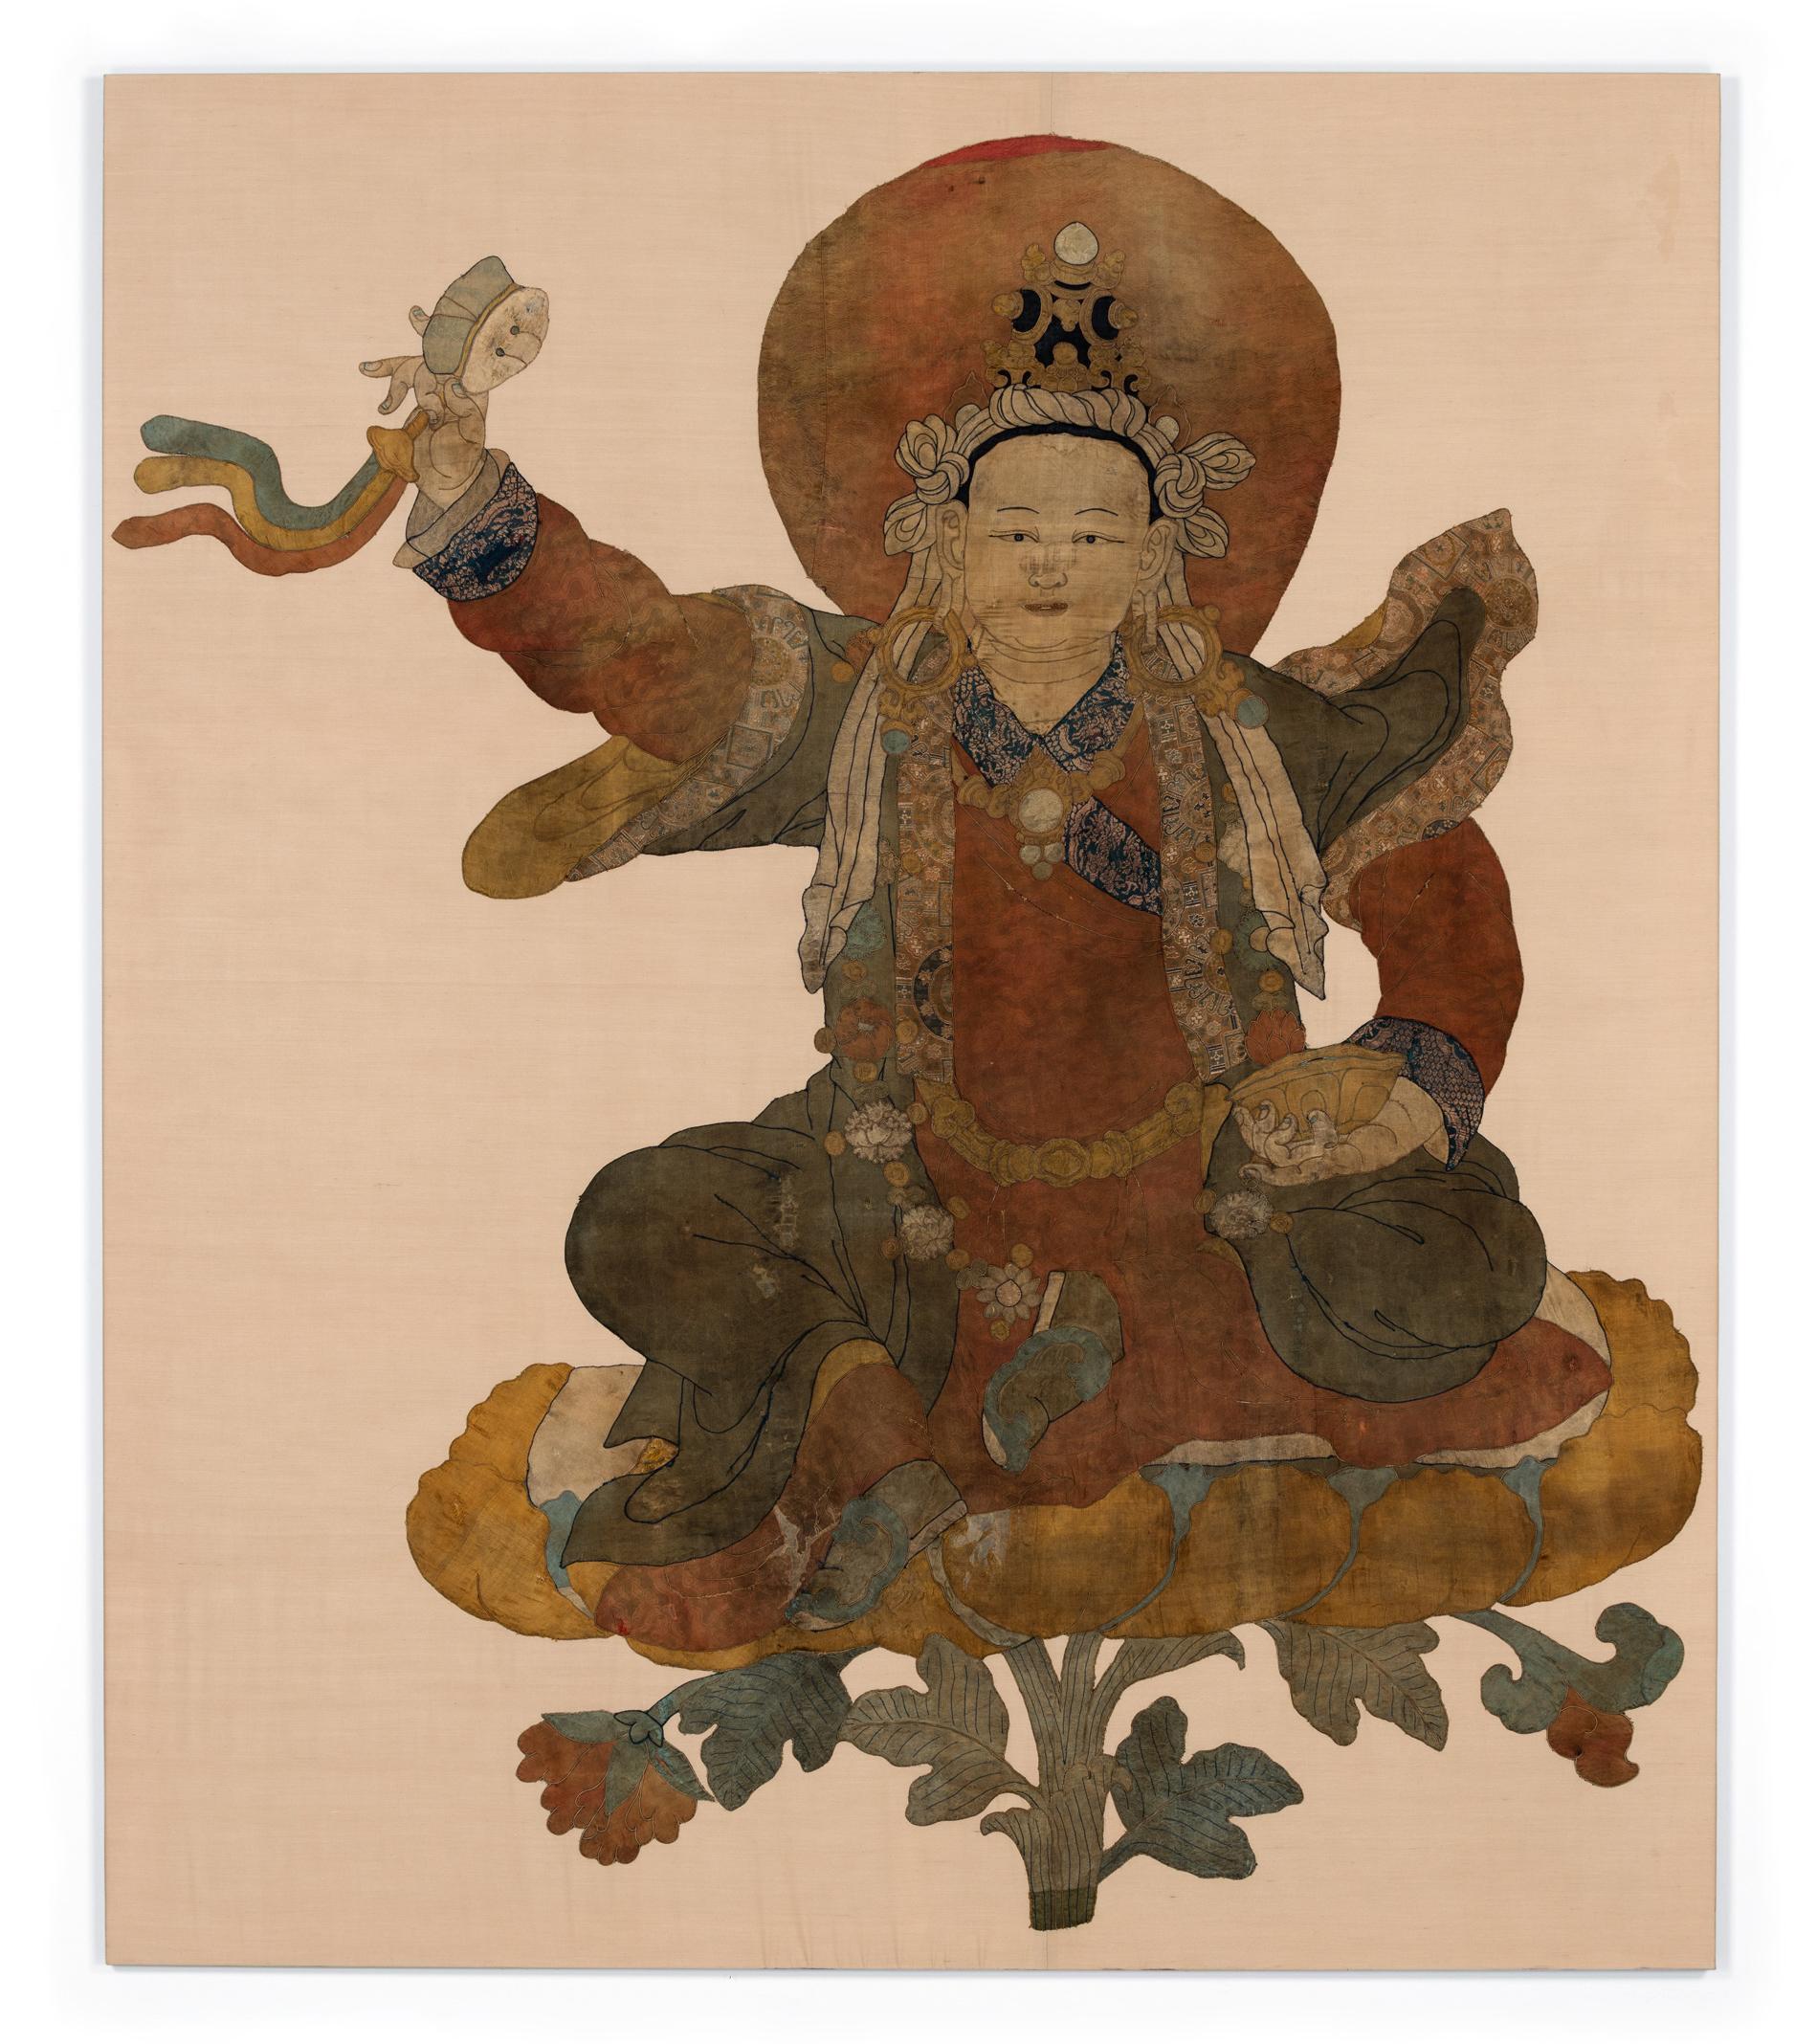 Padmasambhava as Loden Choksé, Tibet, 17th century, silk appliqué, 84 1/8 x 71 5/8 inches, image courtesy Rubin Museum of Art